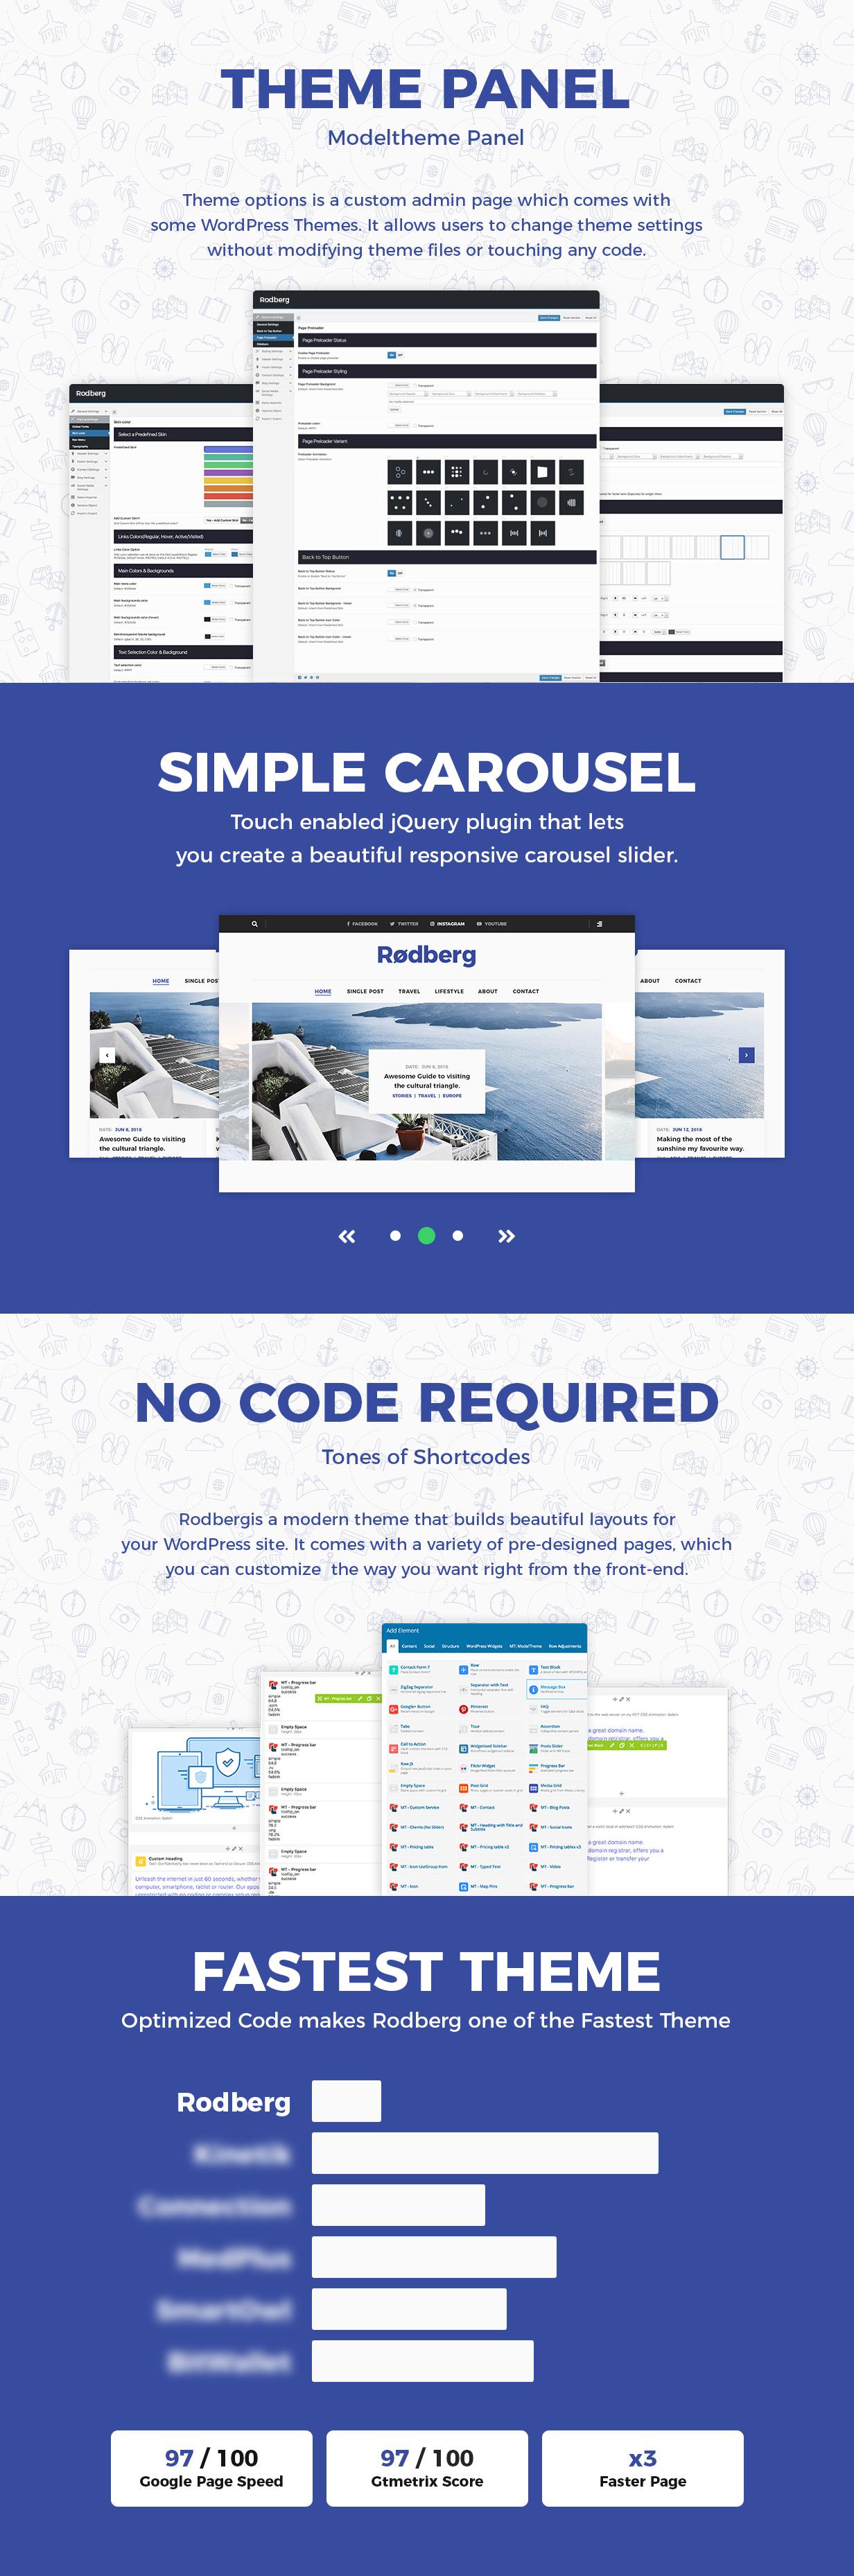 Rodberg - Travel Blog WordPress Theme Gutenberg Compatible - 4